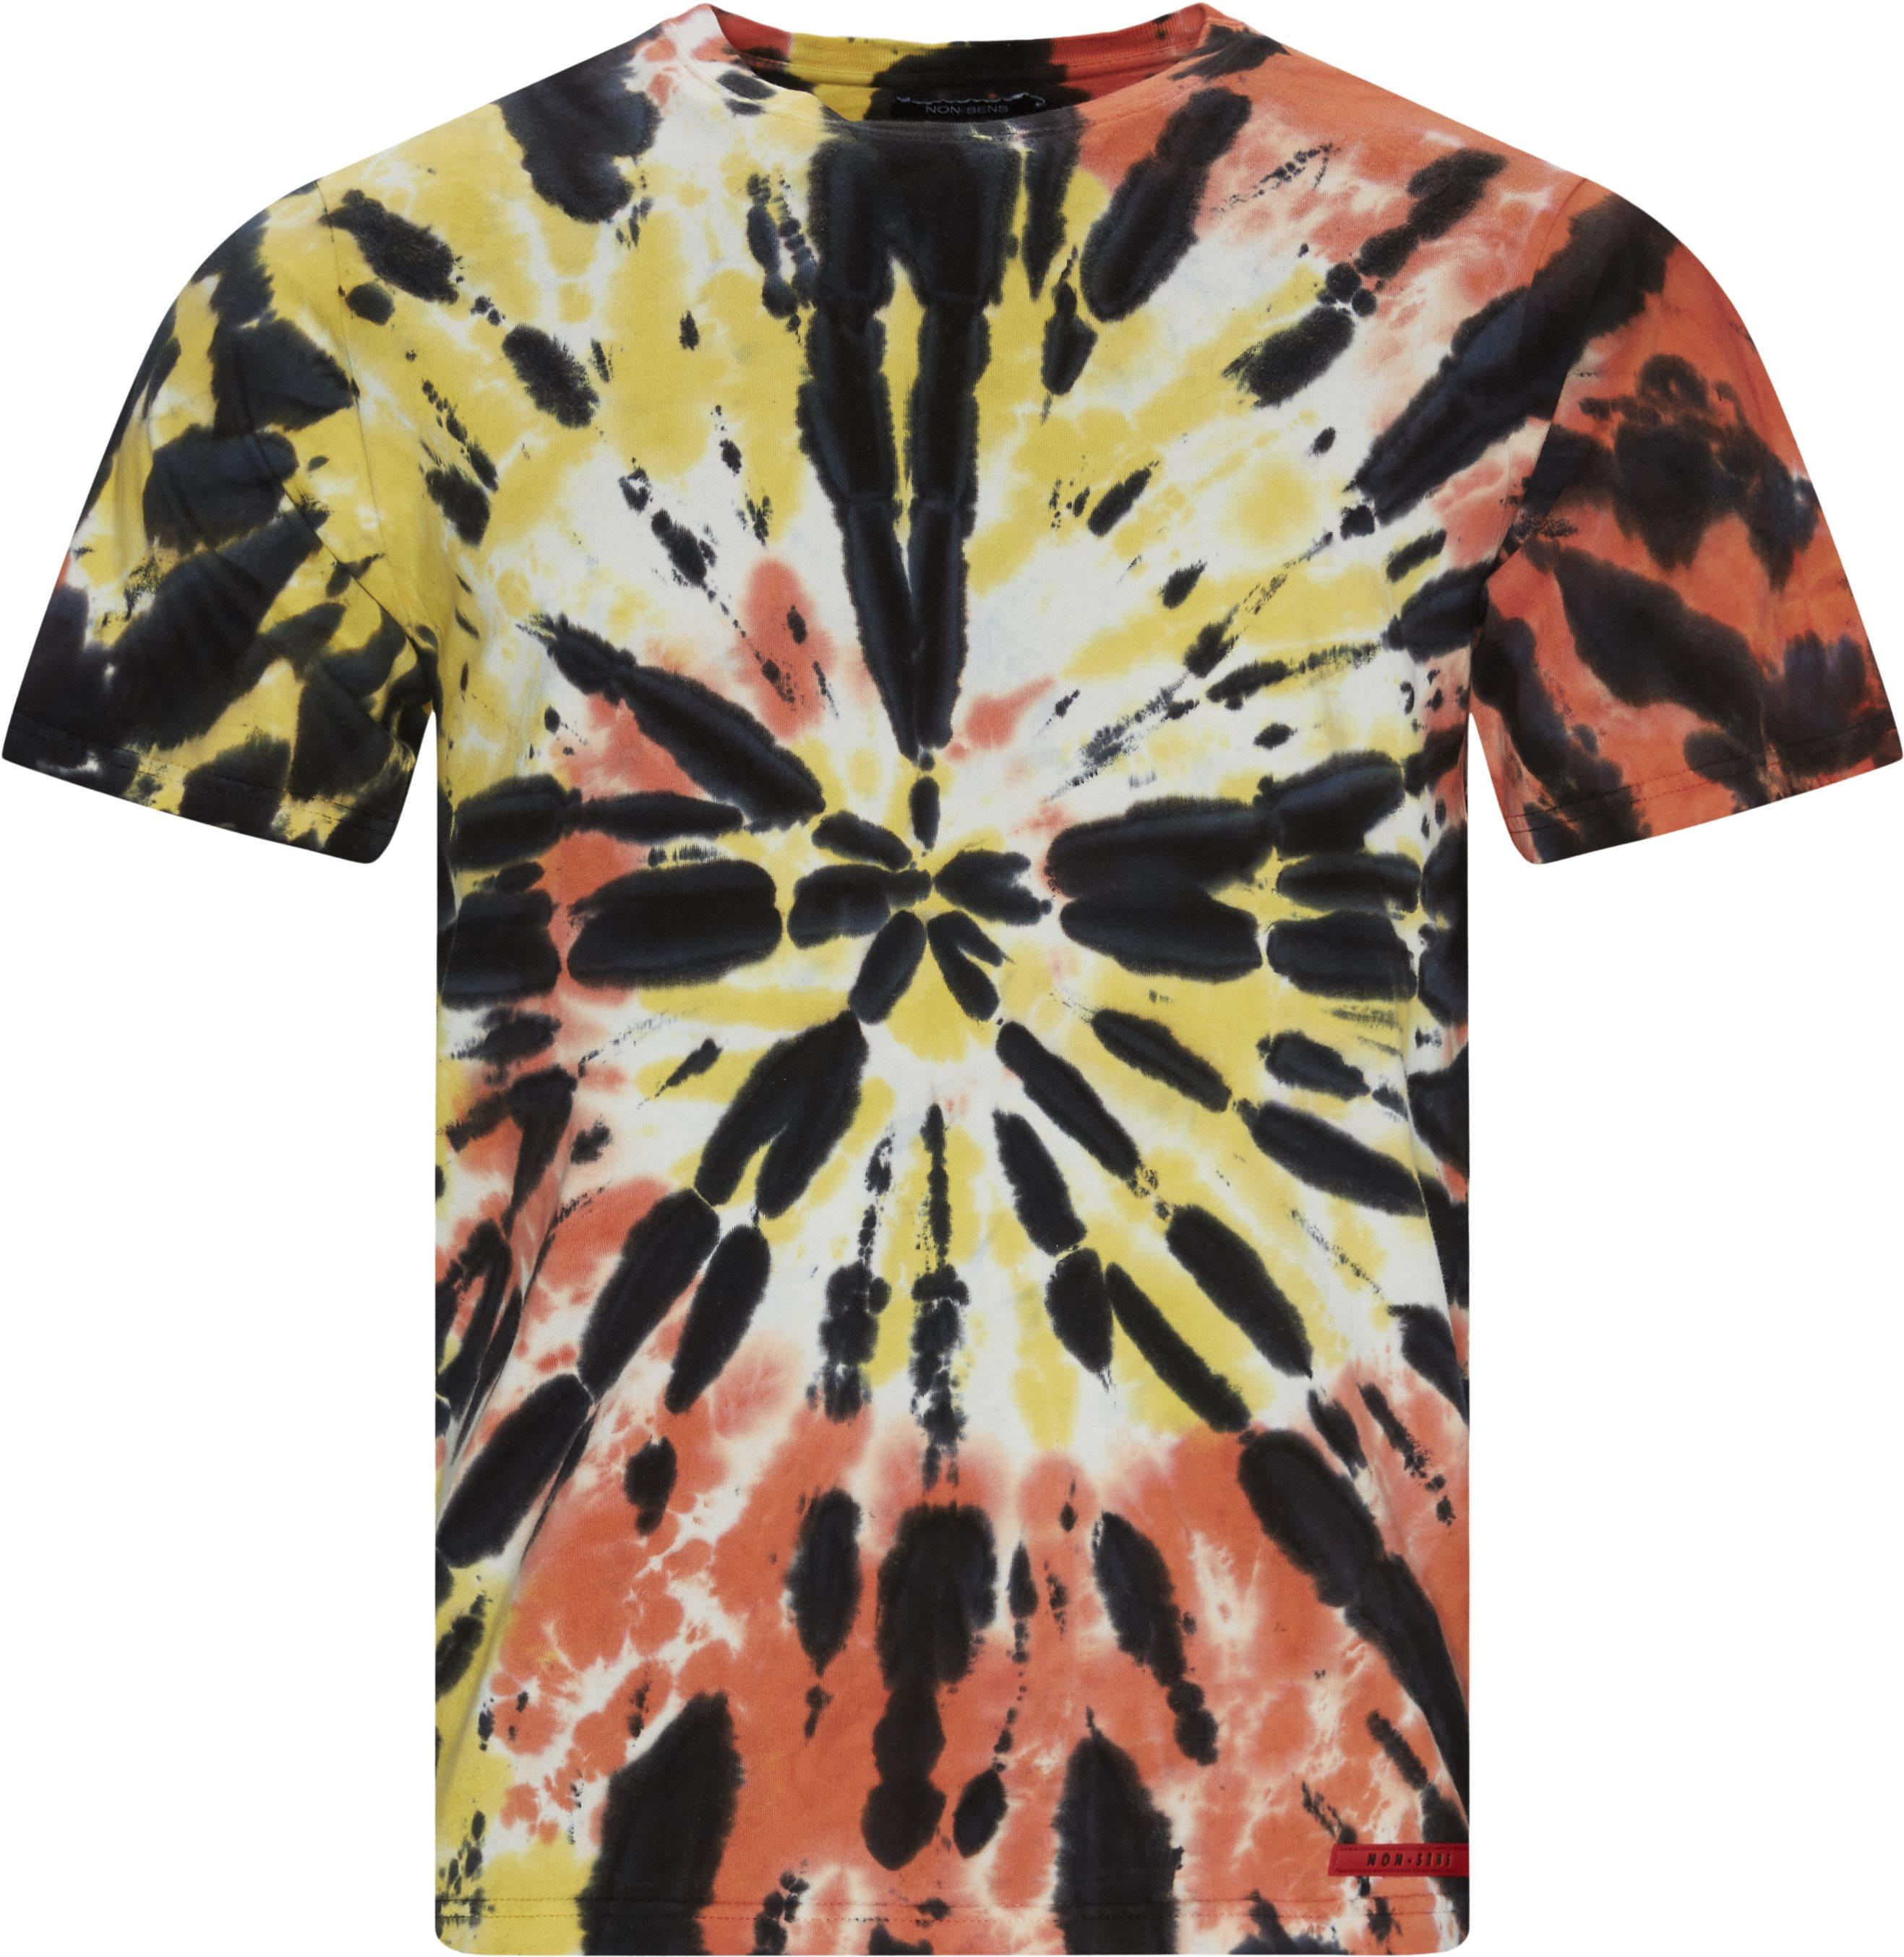 Niagara Tee - T-shirts - Regular fit - Multi